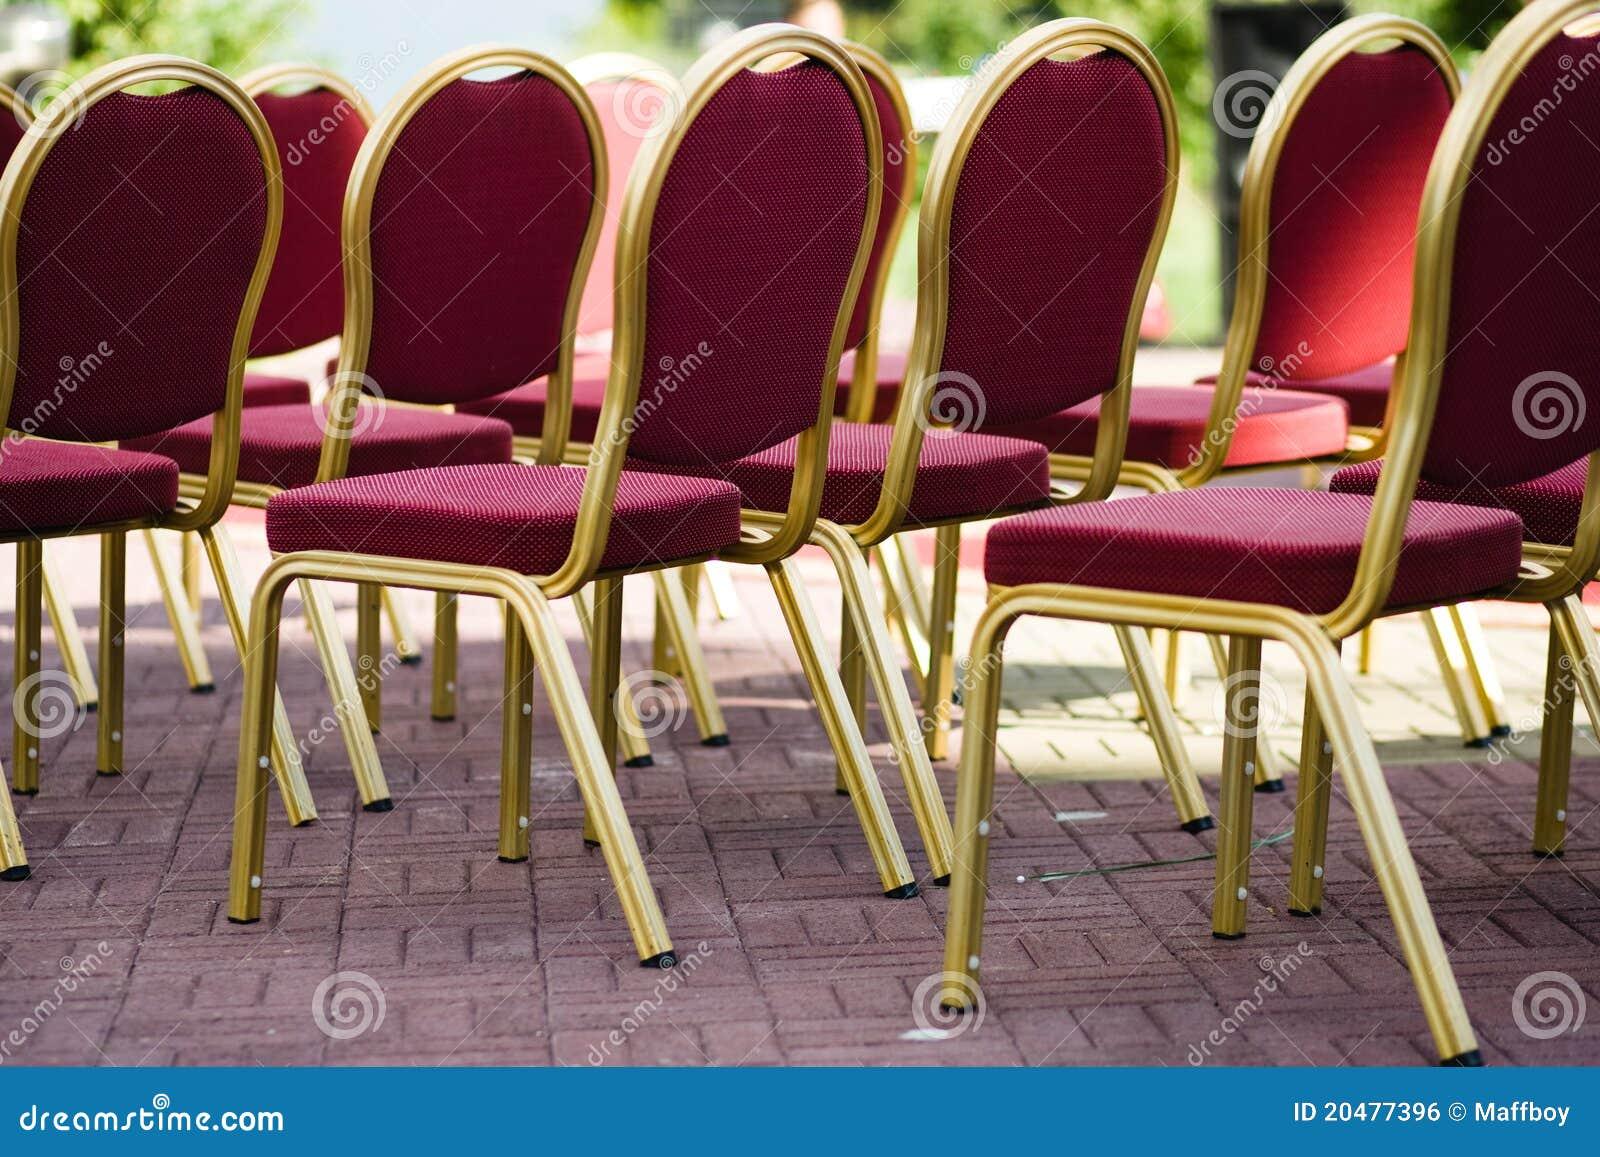 Wedding chairs royalty free stock image image 20477396 royalty free stock photo download wedding chairs junglespirit Choice Image